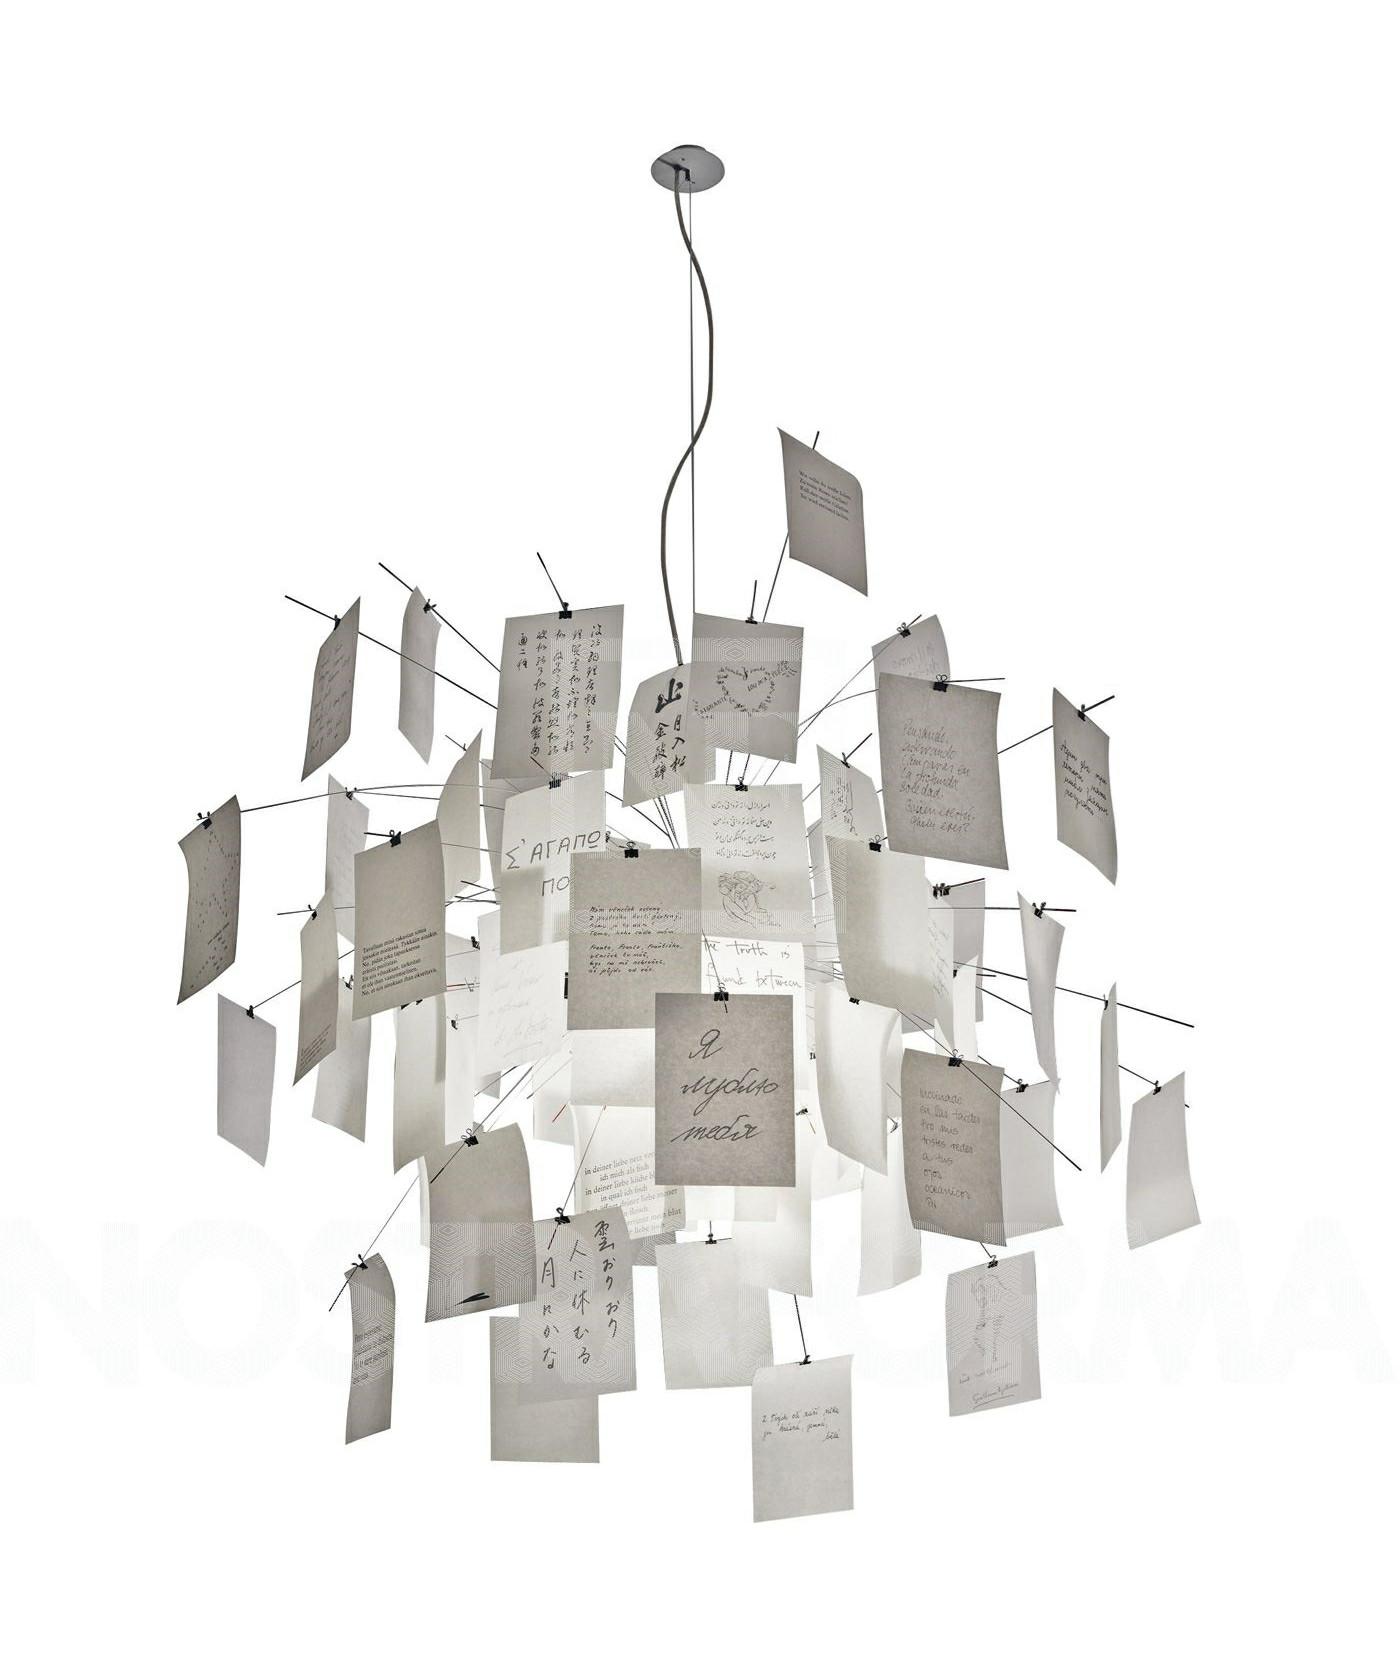 Zettelz lampe 5 Pendel - Ingo Maurer